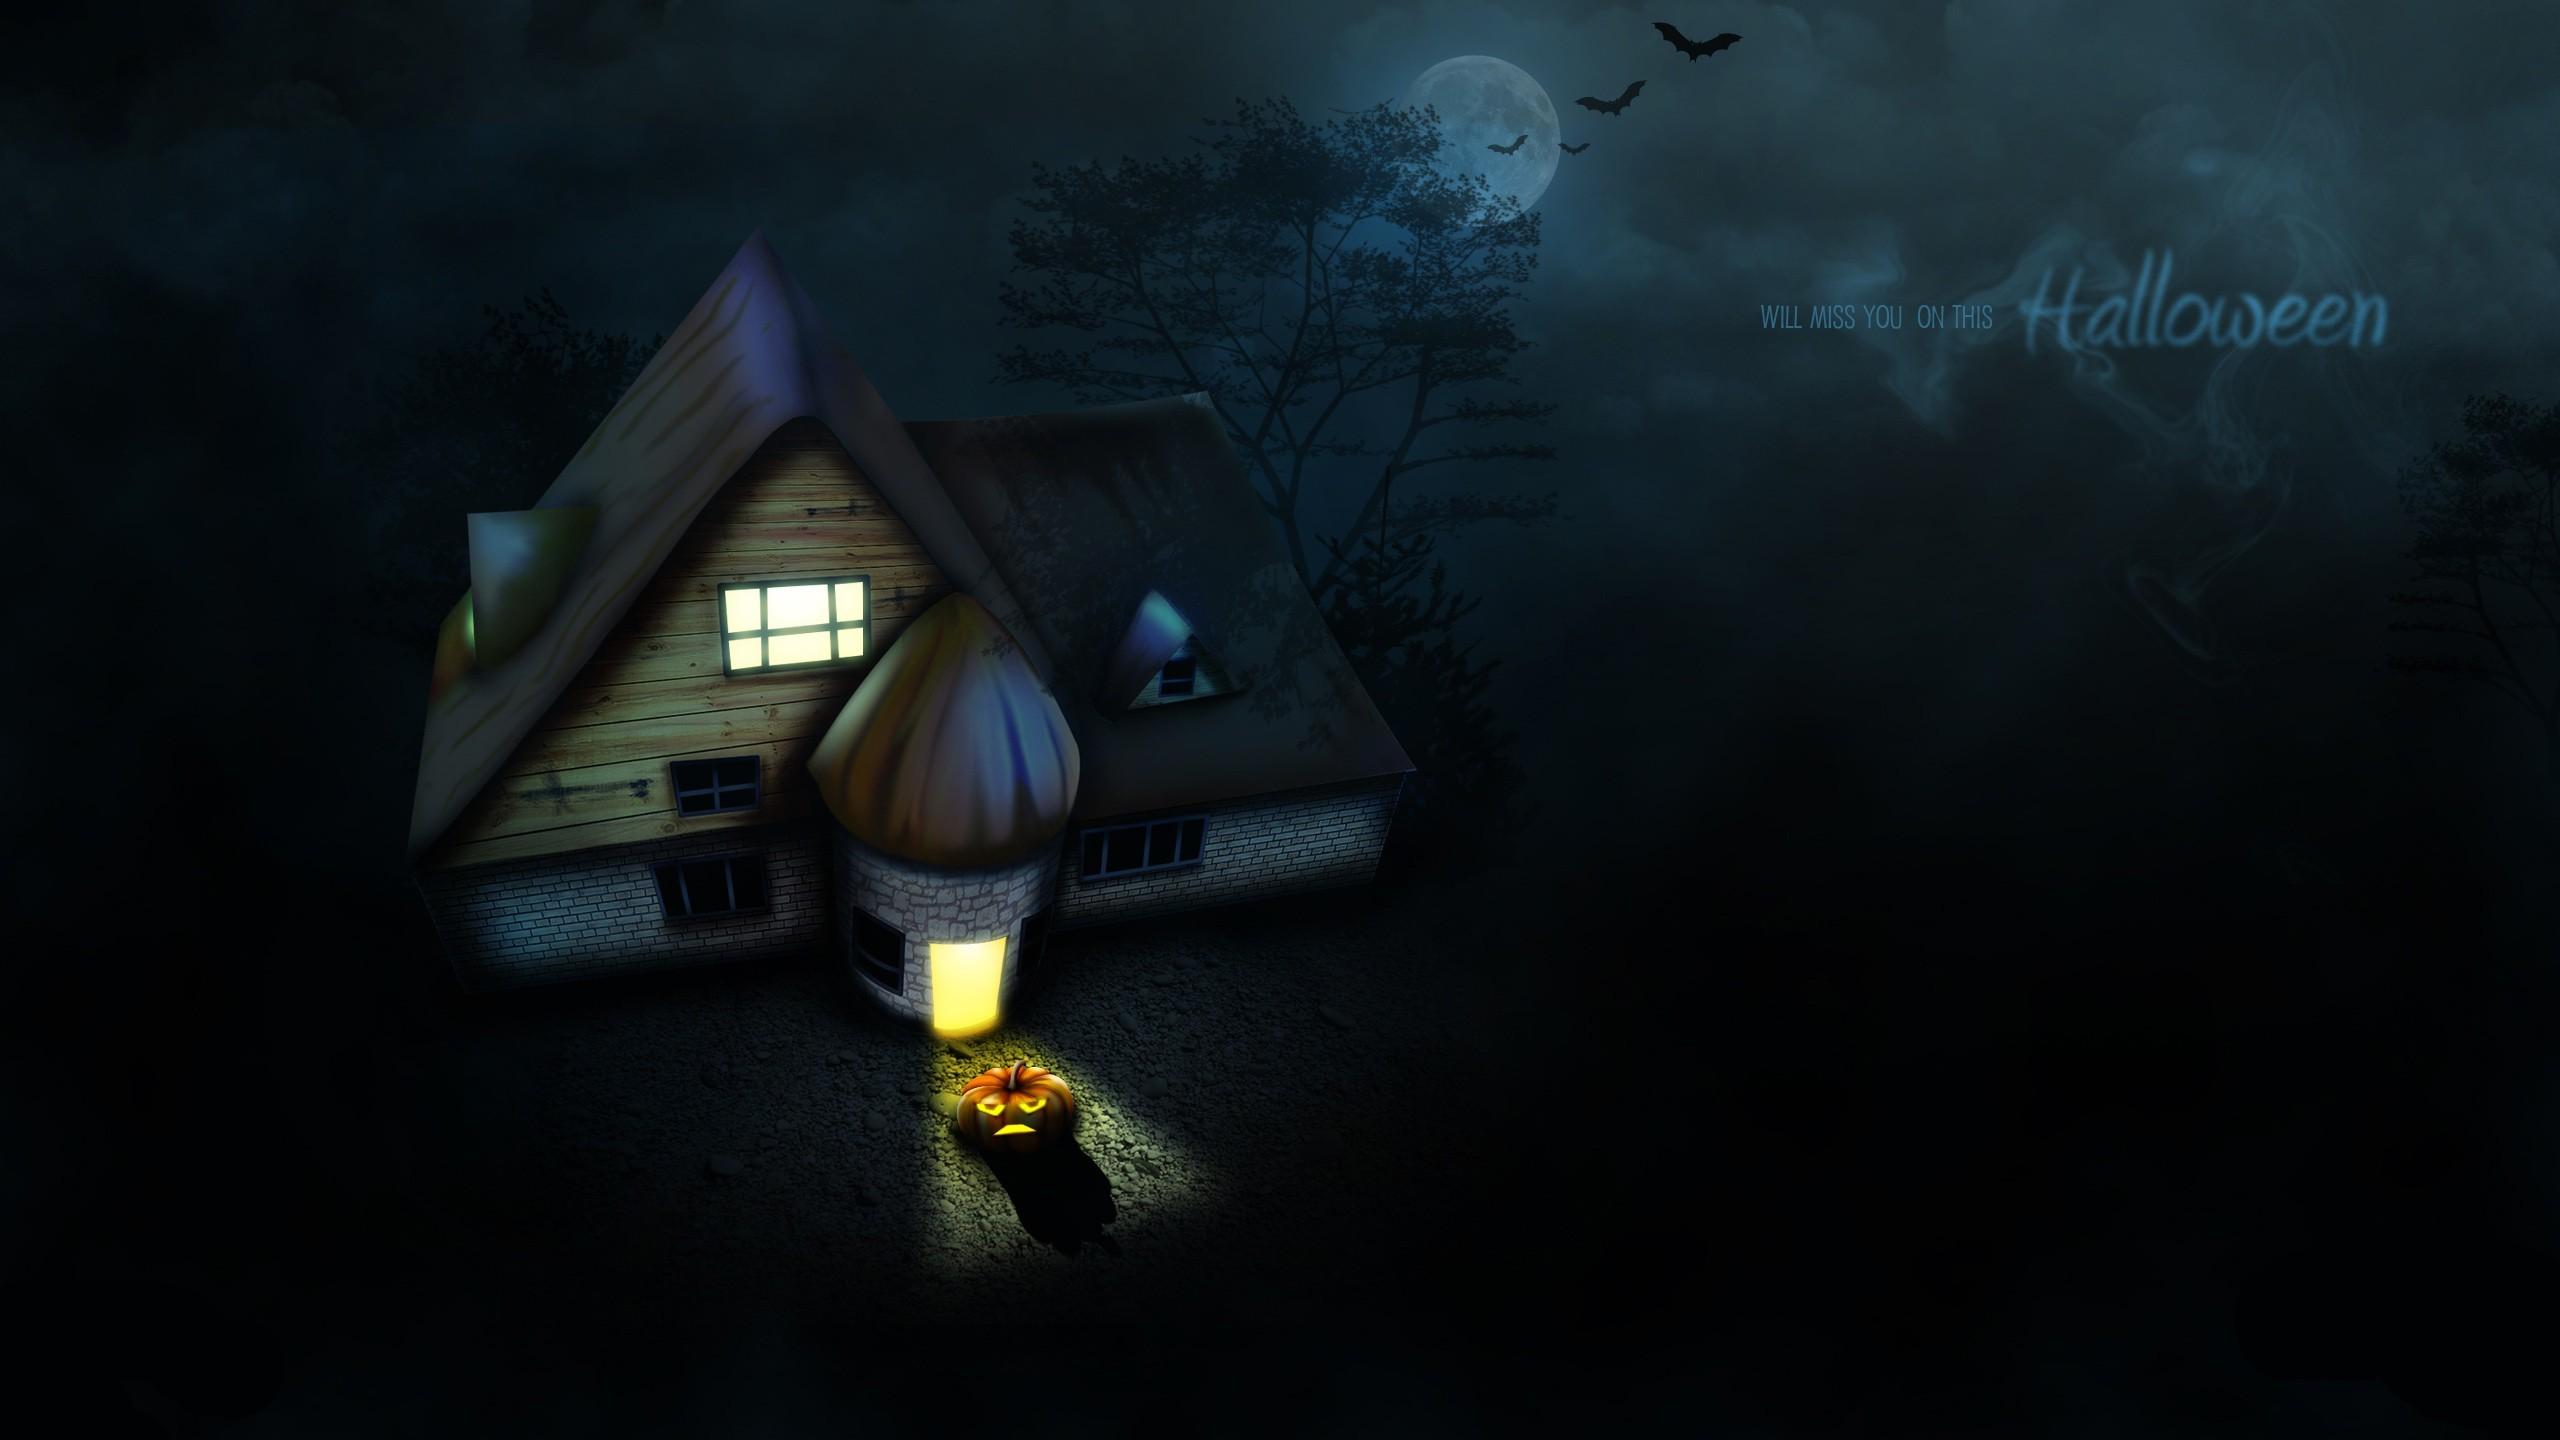 … x 1440 Original. Description: Download Halloween House Celebrations  wallpaper …